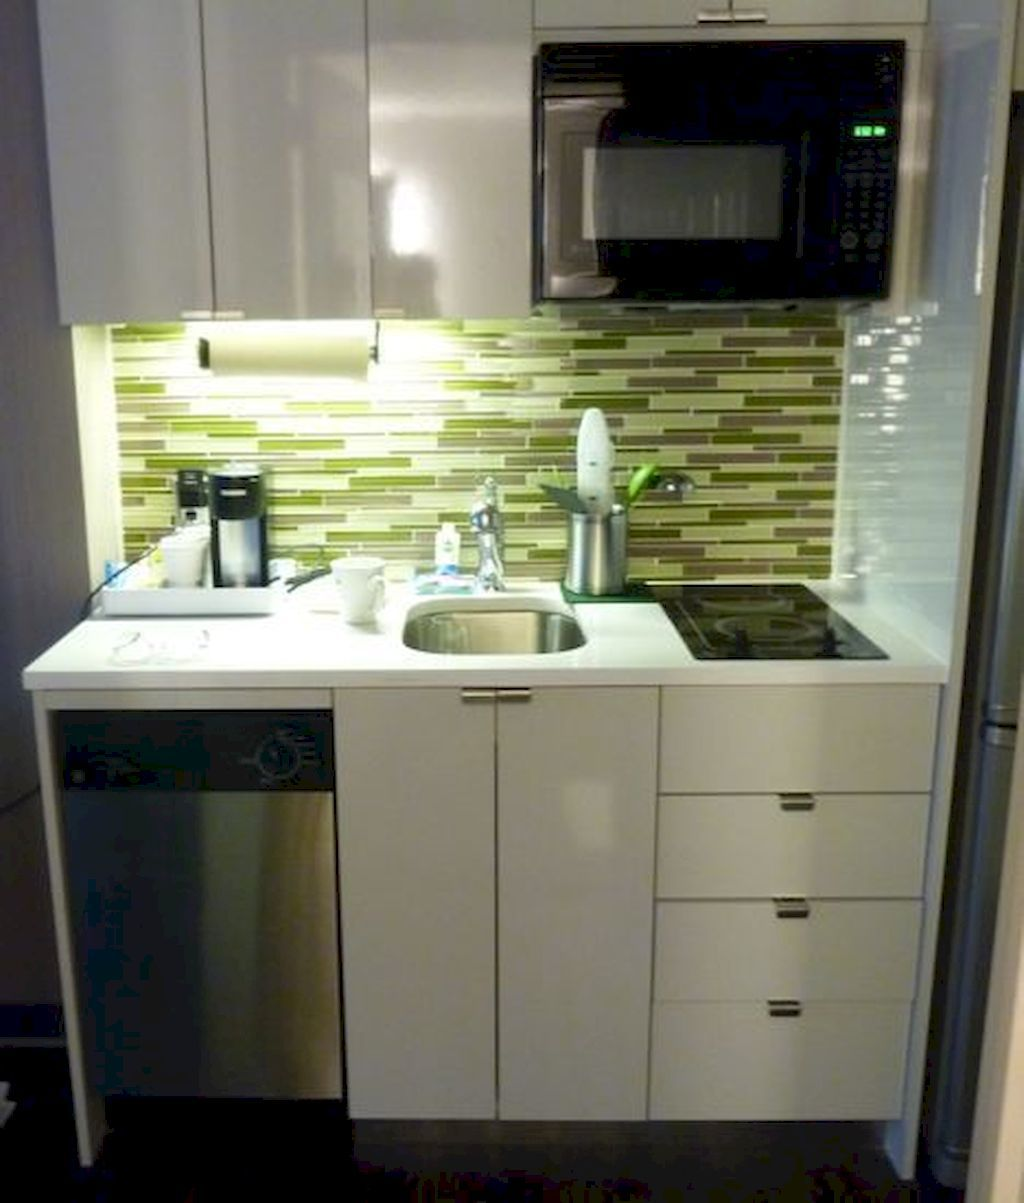 The Best of Little Apartment Kitchen Decor images